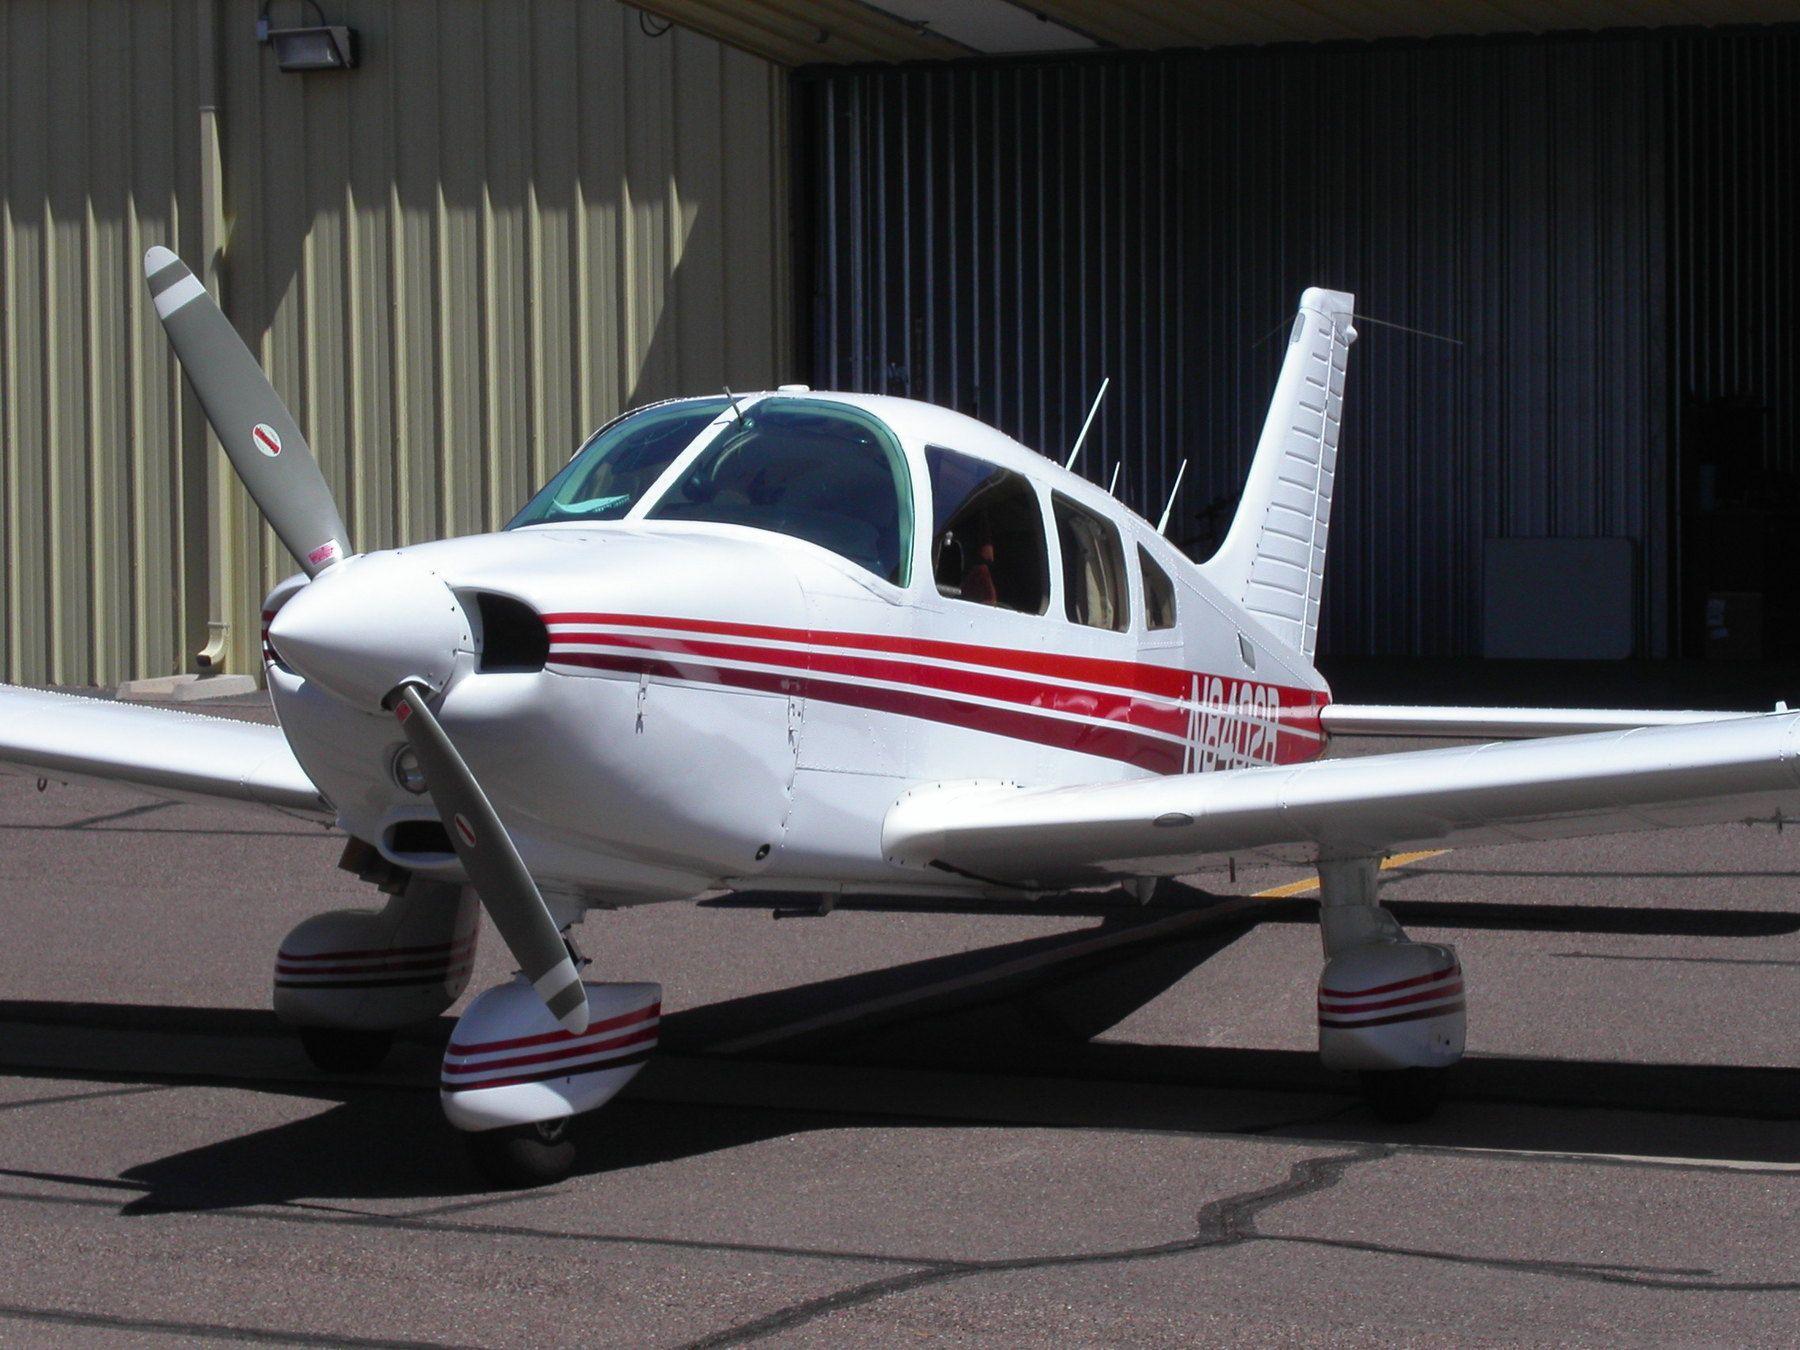 1981 Piper PA28236 Dakota for sale in (3R9) Austin, TX